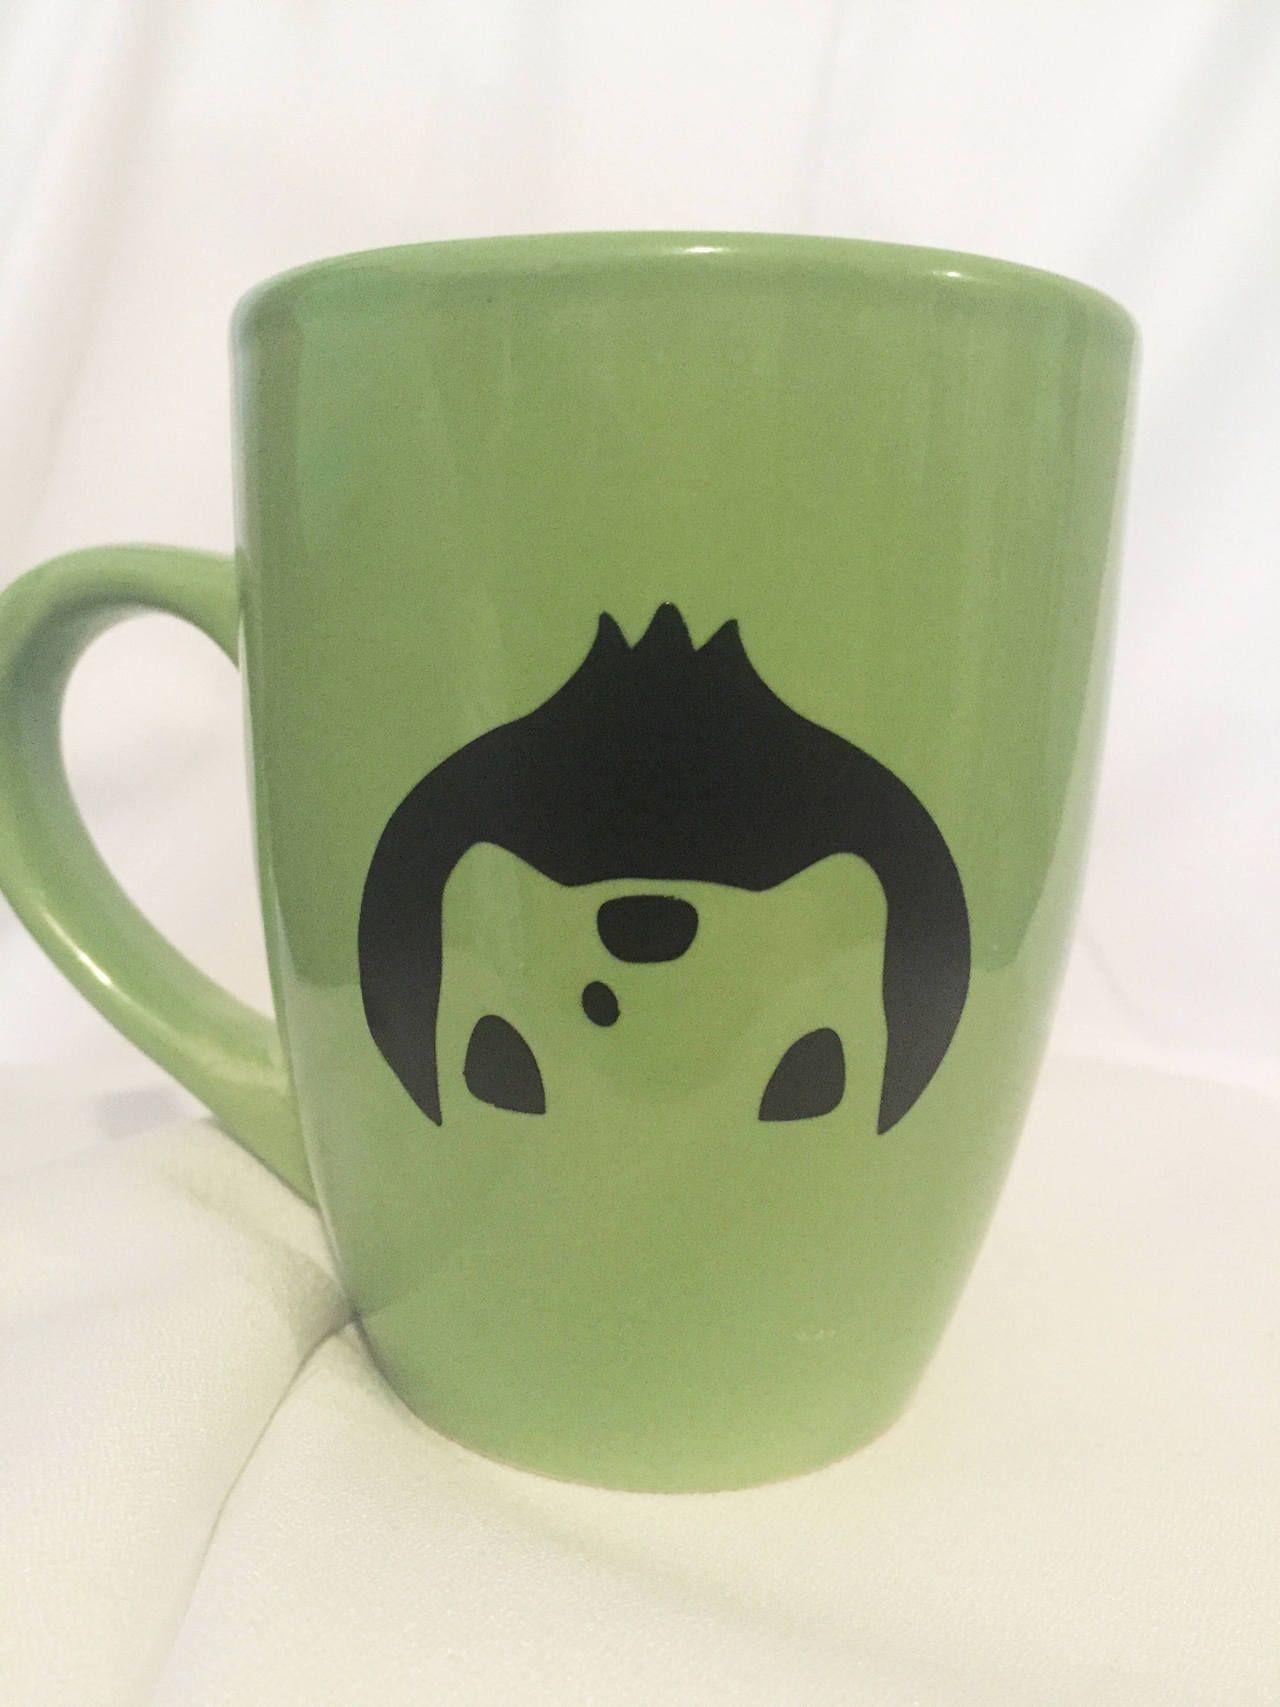 Starter Pokemon Mugs made by Charlette Jauch -